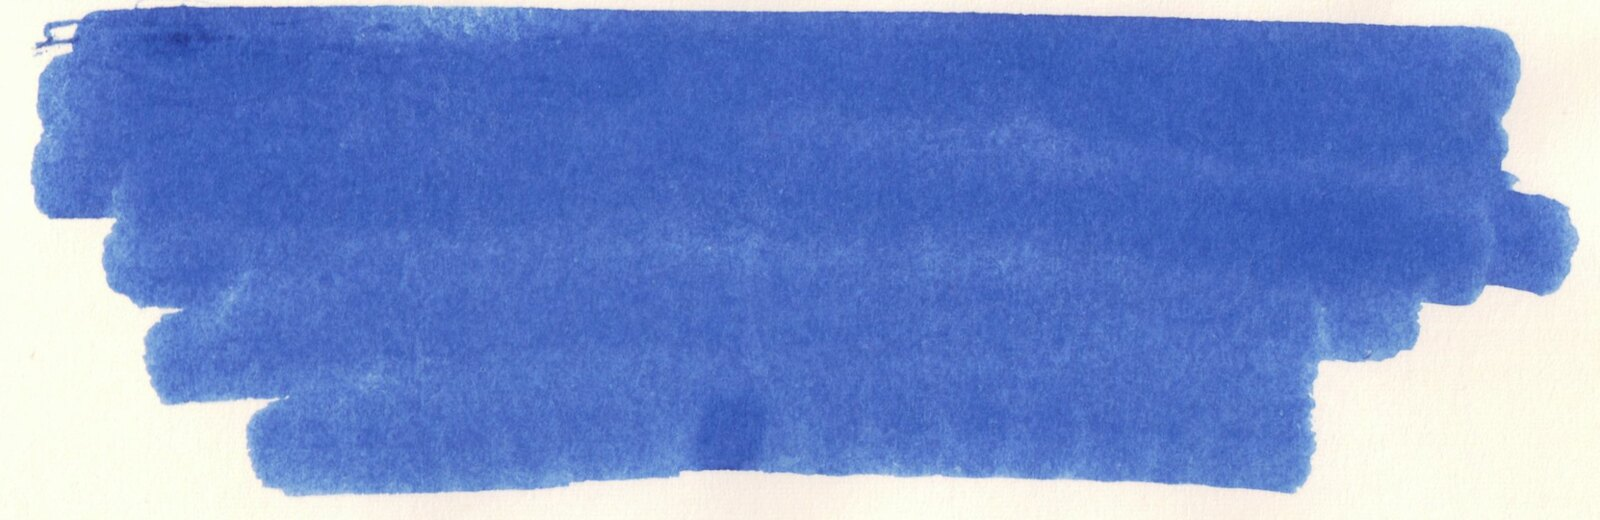 Diamine Sapphire Blue_swab